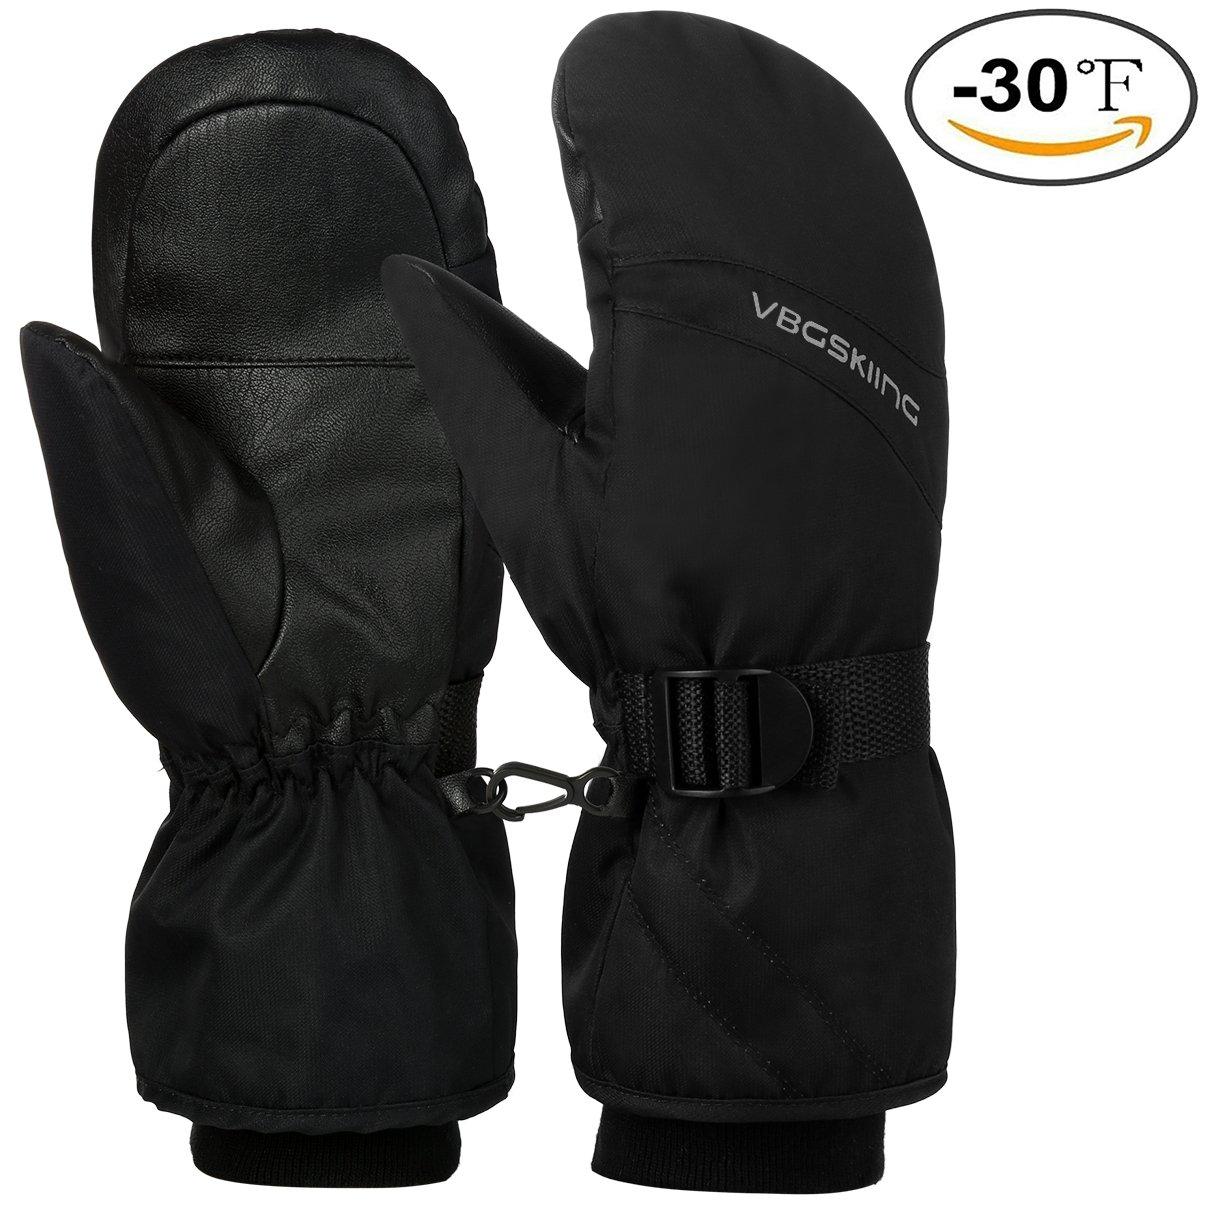 Vbiger Ski Gloves Winter Warm Gloves Splash-proof Sports Mittens for Women Men